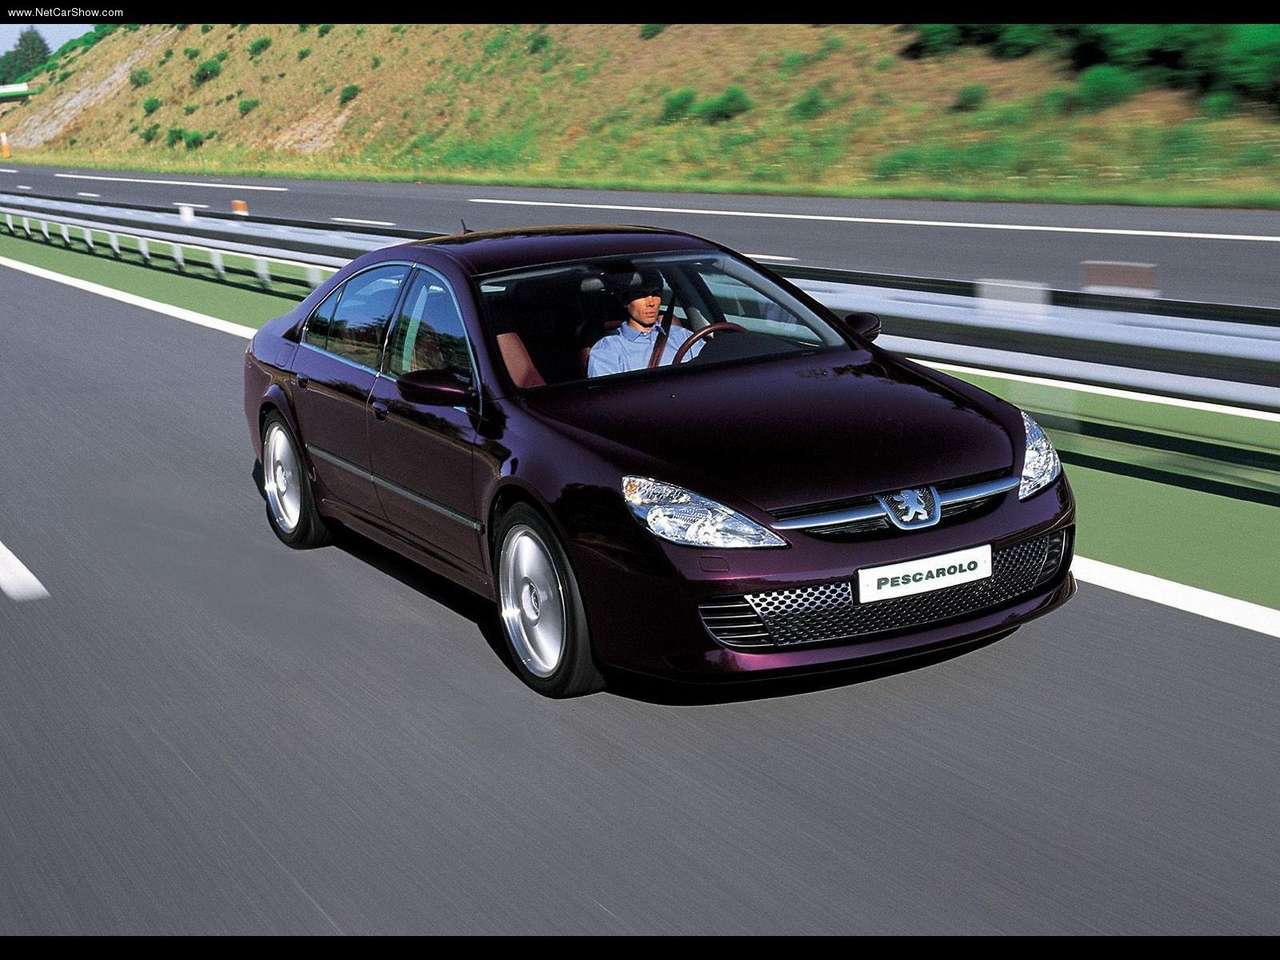 Peugeot 607 Pescarolo - Proto tu es... proto tu resteras ! 5